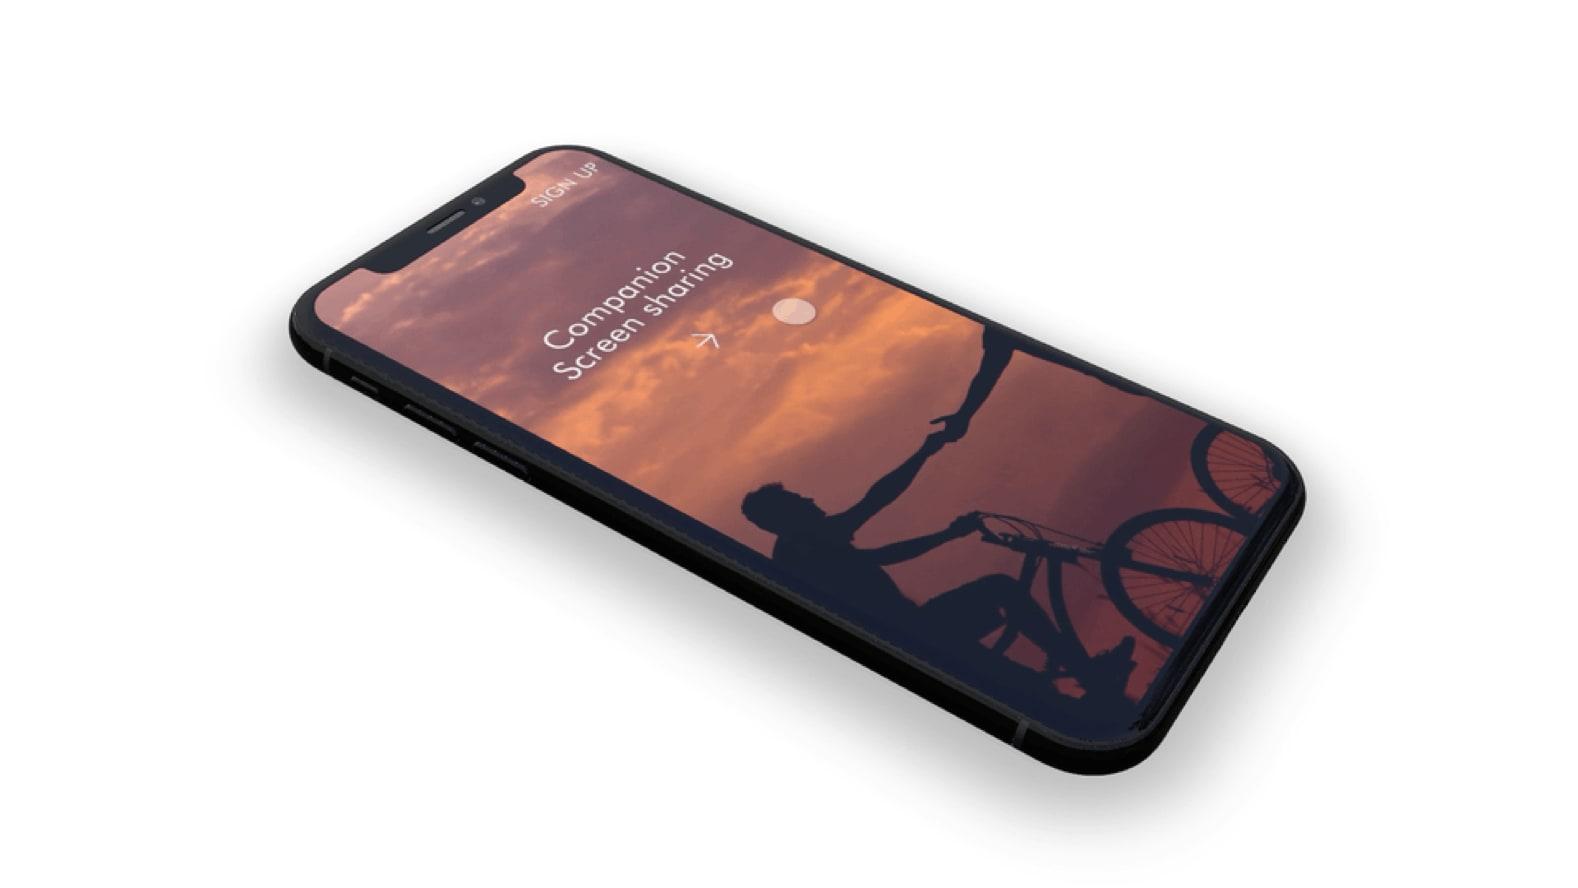 Iphone mockup